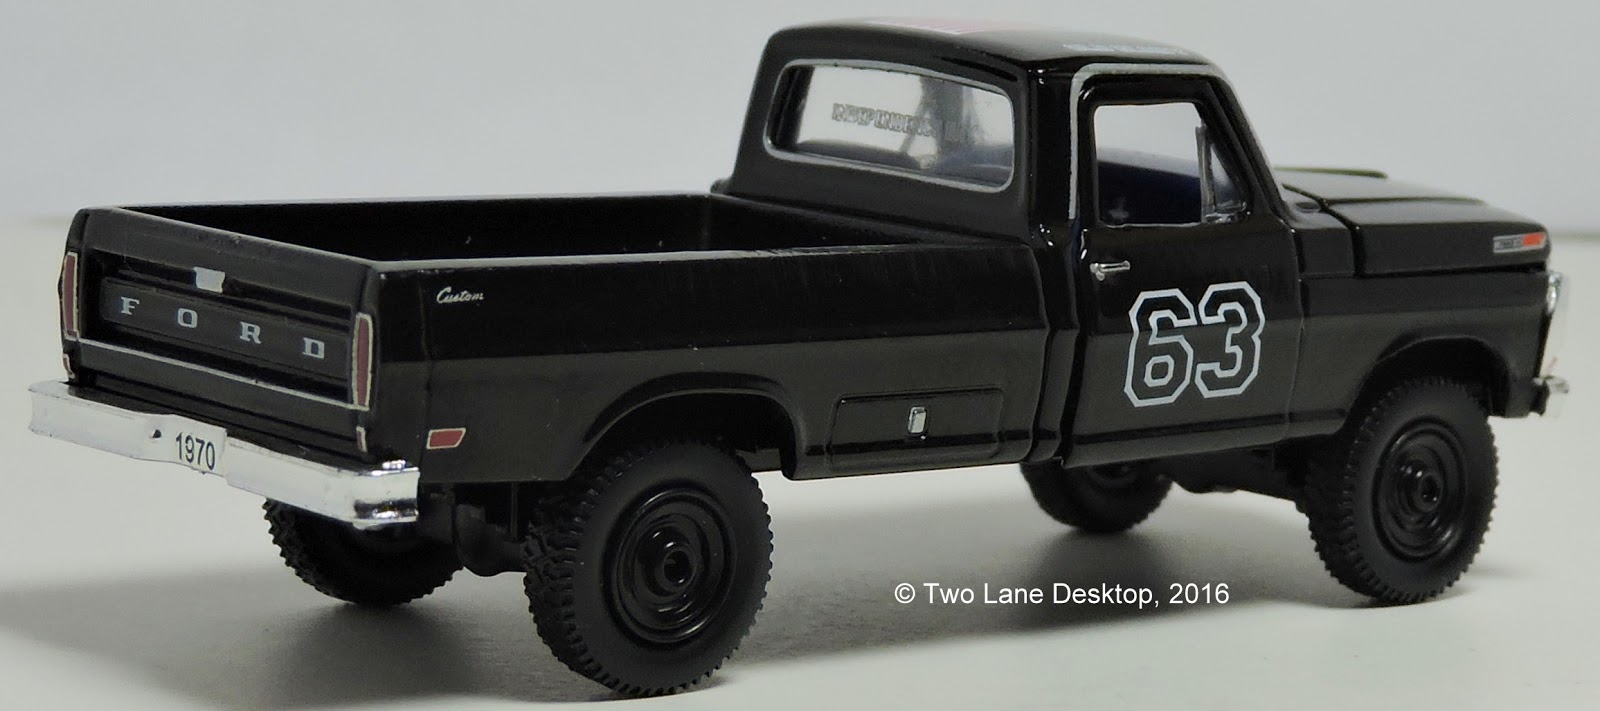 1970 Ford Ranger 4x4 M Machines Custom Two Lane Desktop 1600x711